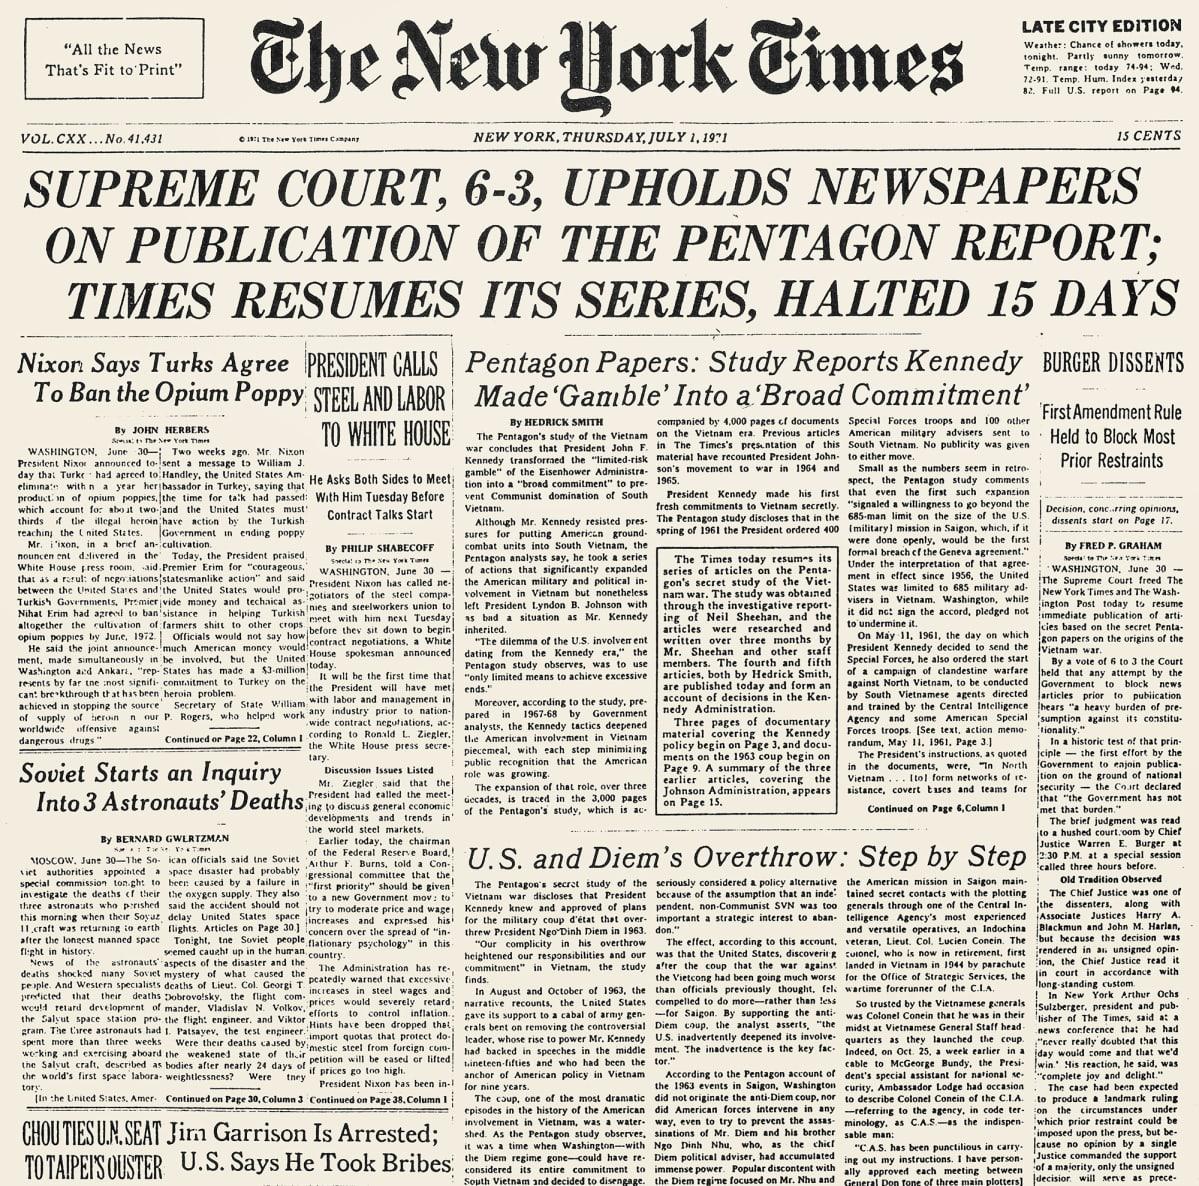 New York Times etusivu 1.7.1971.